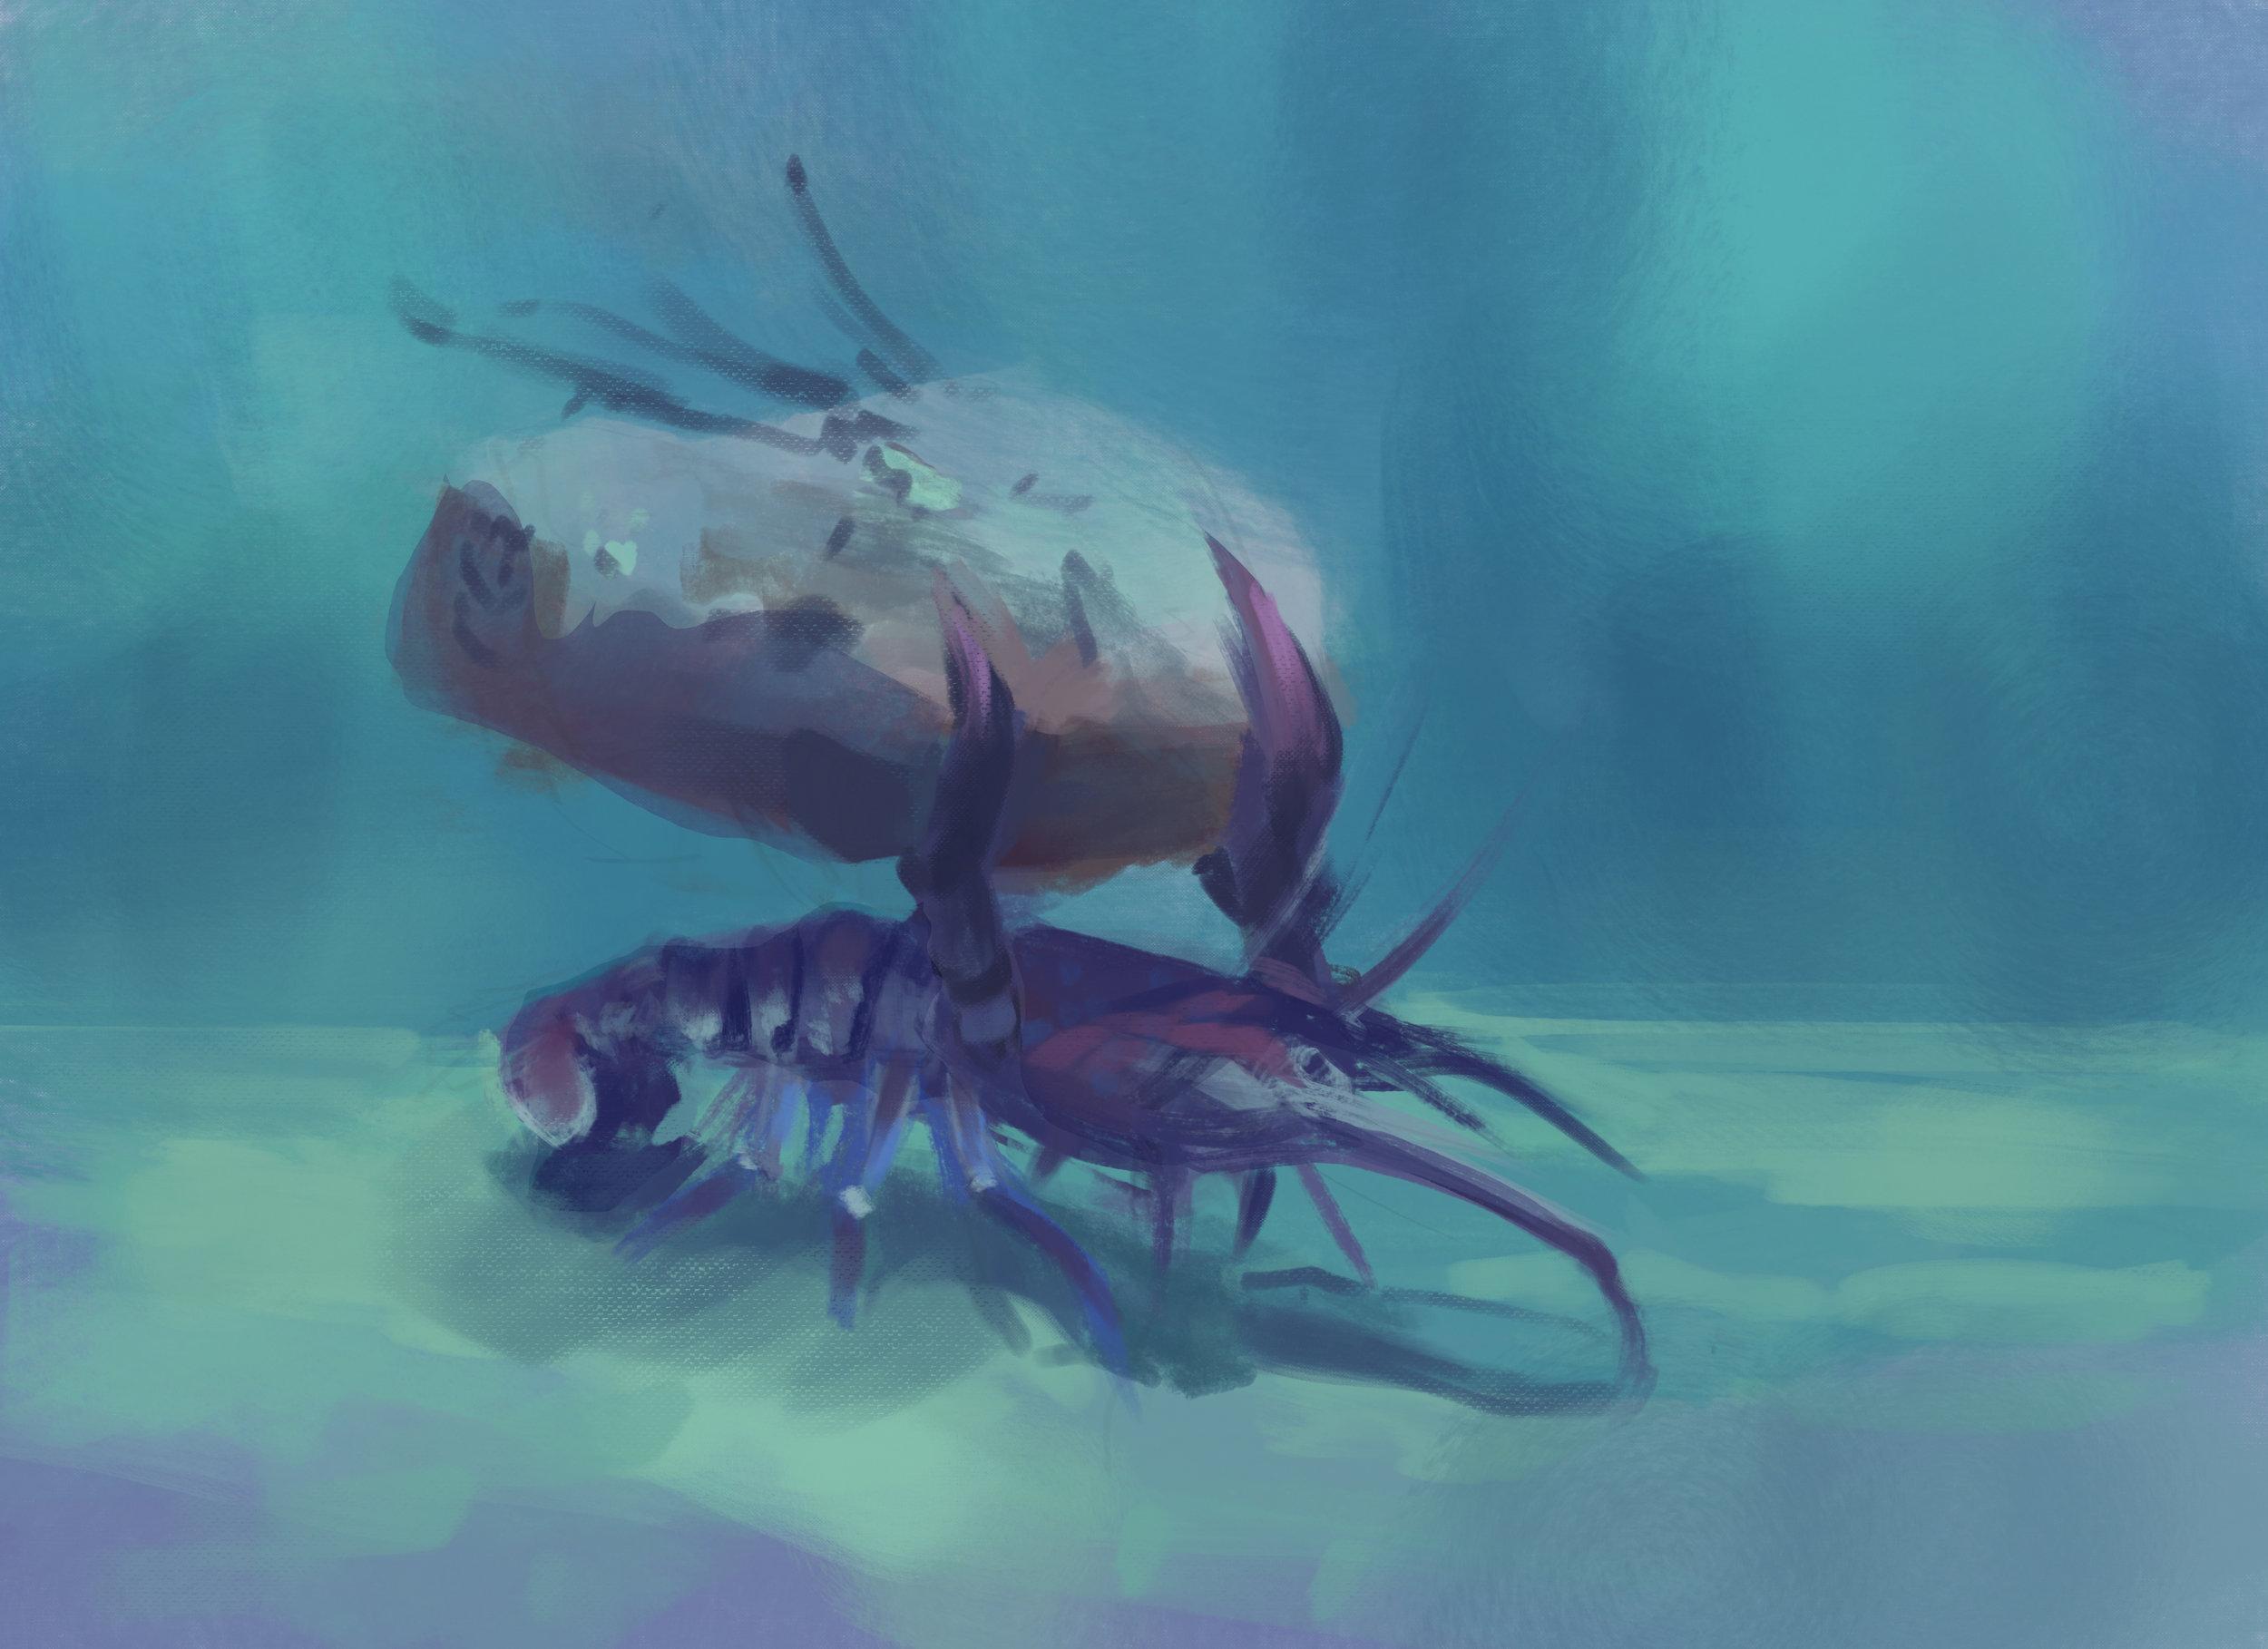 spitpaint-lobster-hideout.jpg